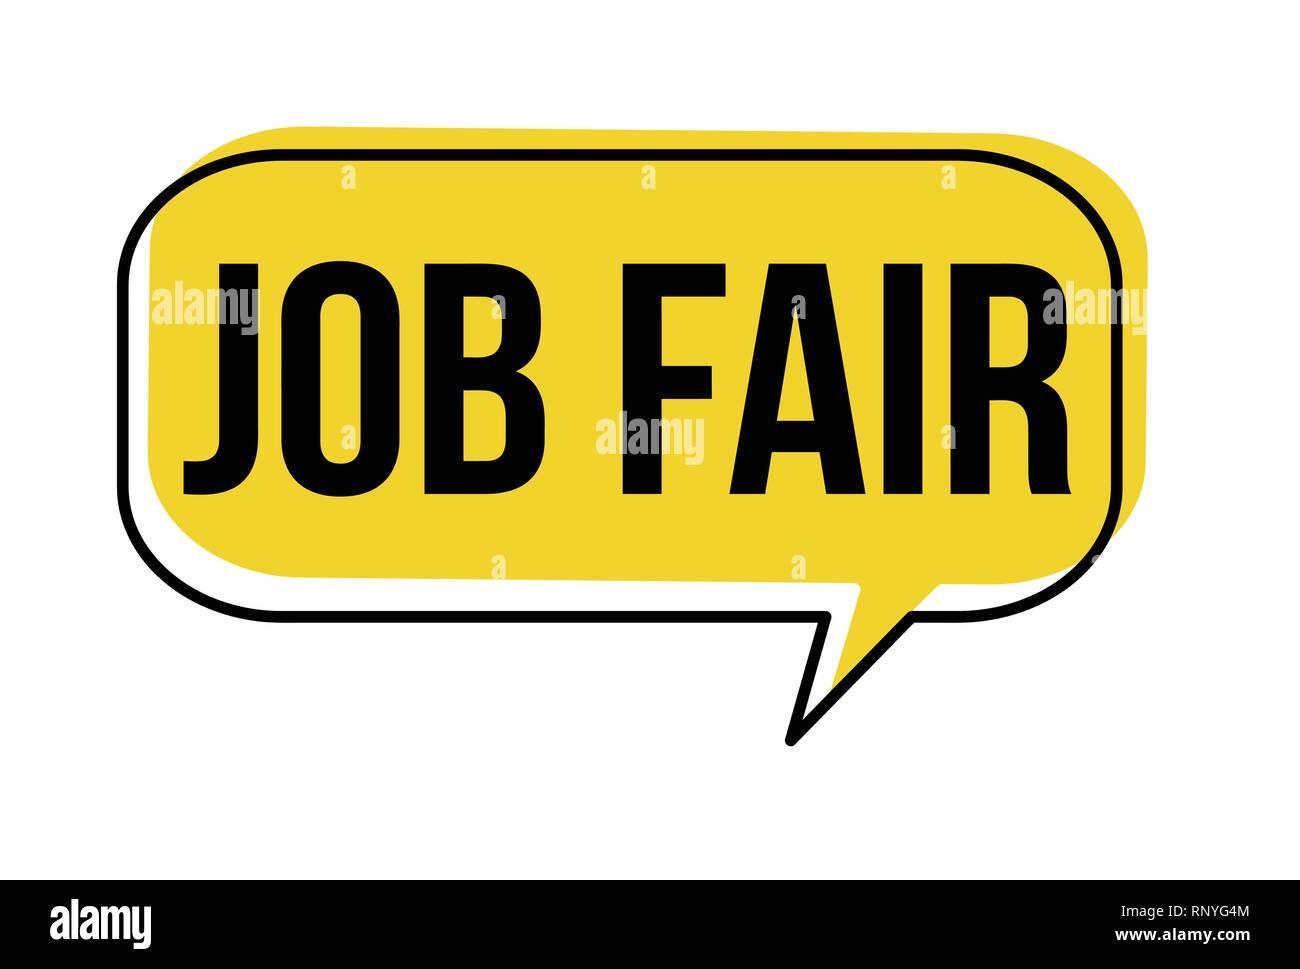 Job fair speech bubble on white background, vector illustration - Stock Vector